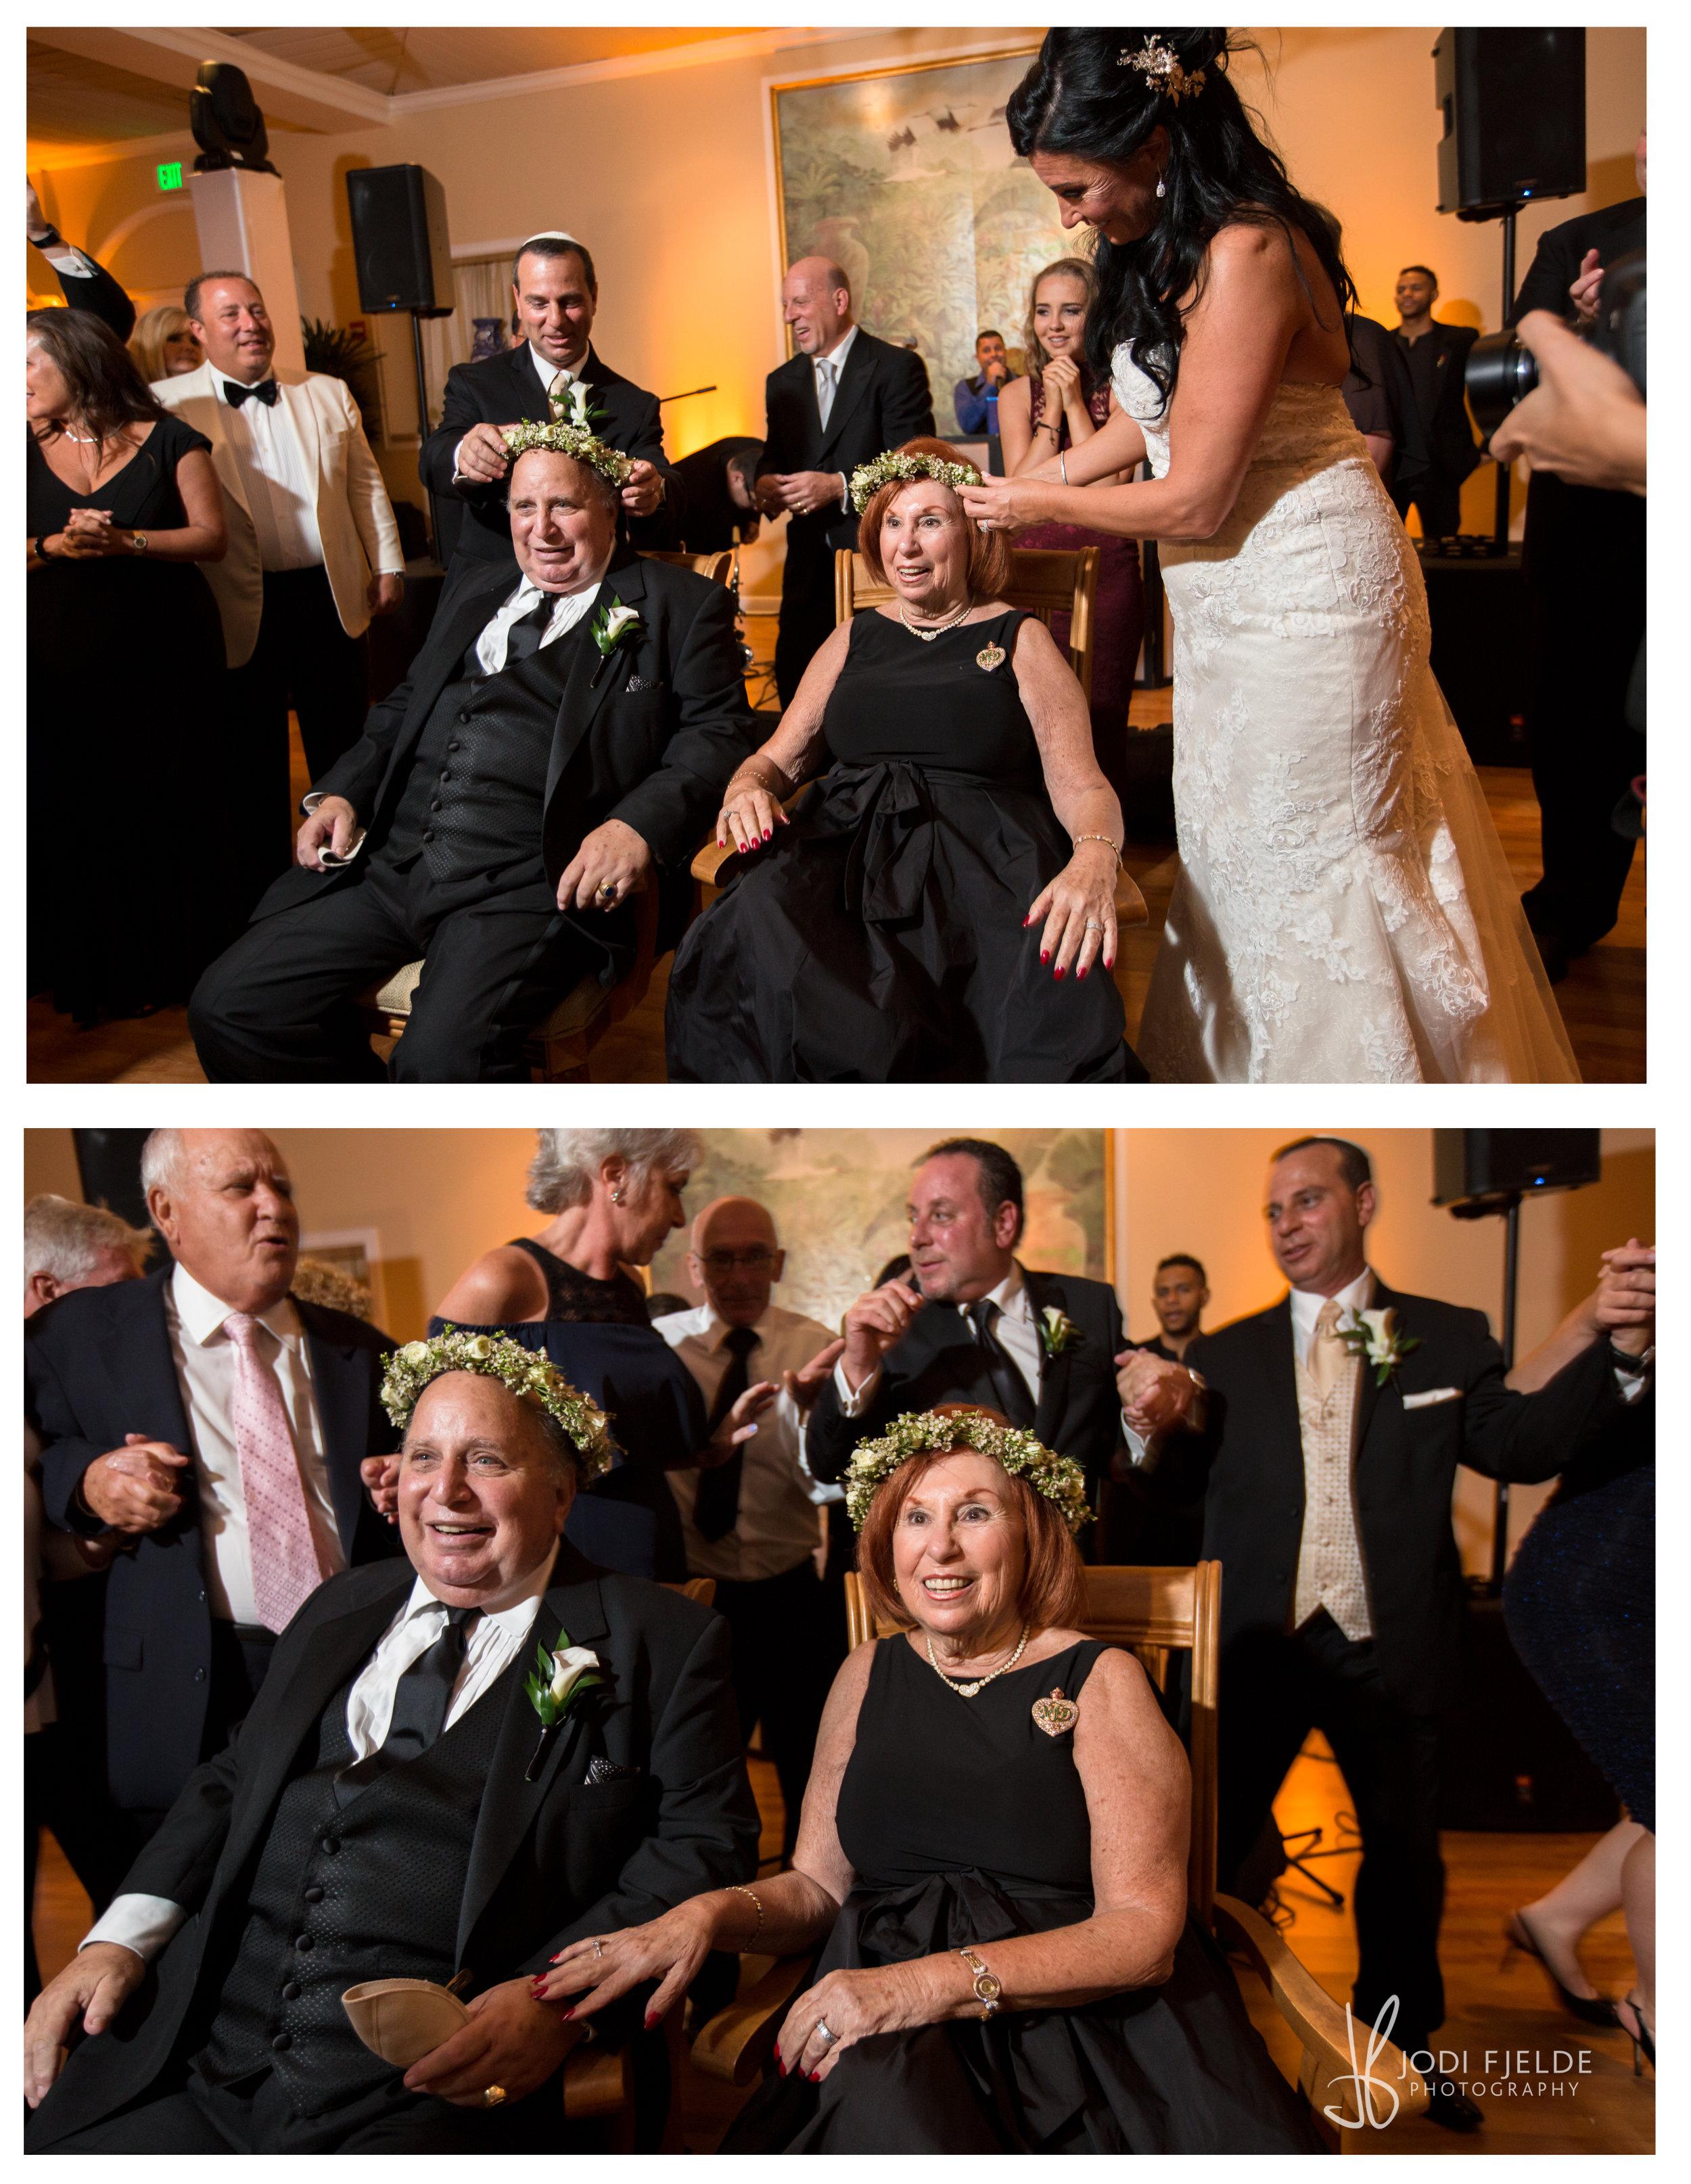 Benvenuto_Boynton_Beach_Wedding_Christine_and Doug_Married 13.jpg